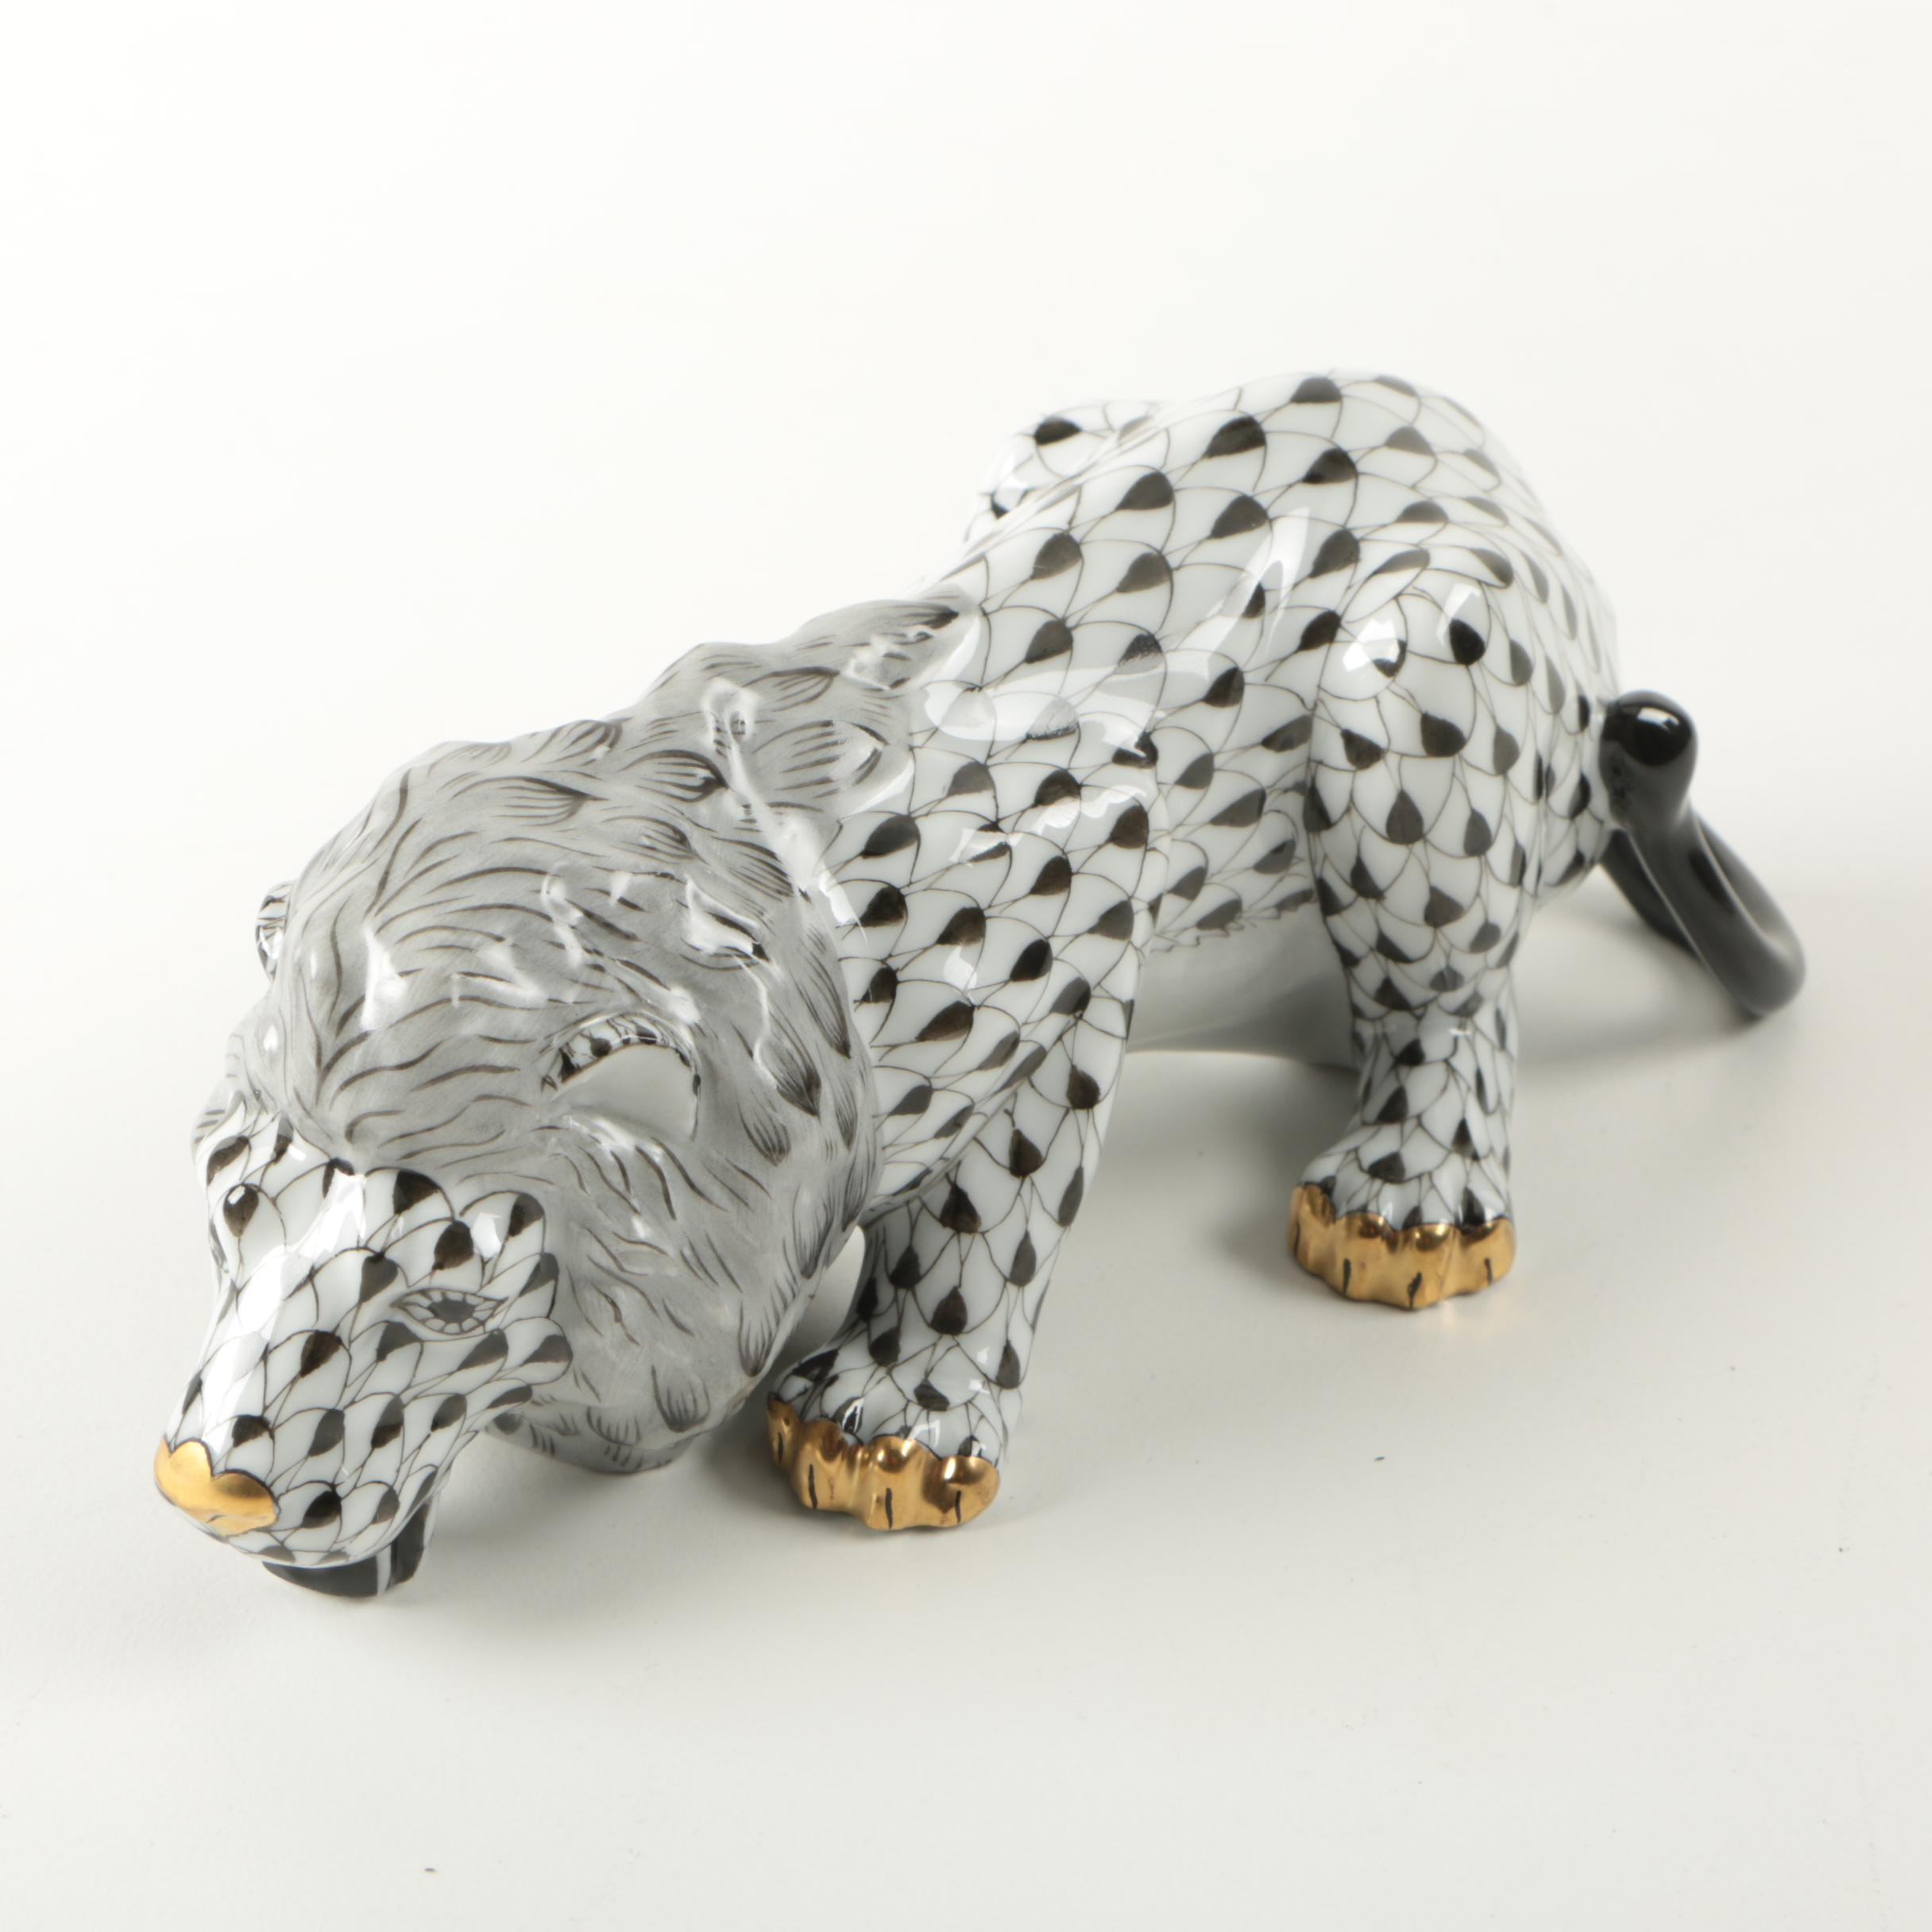 Herend Hungary Lion Figurine